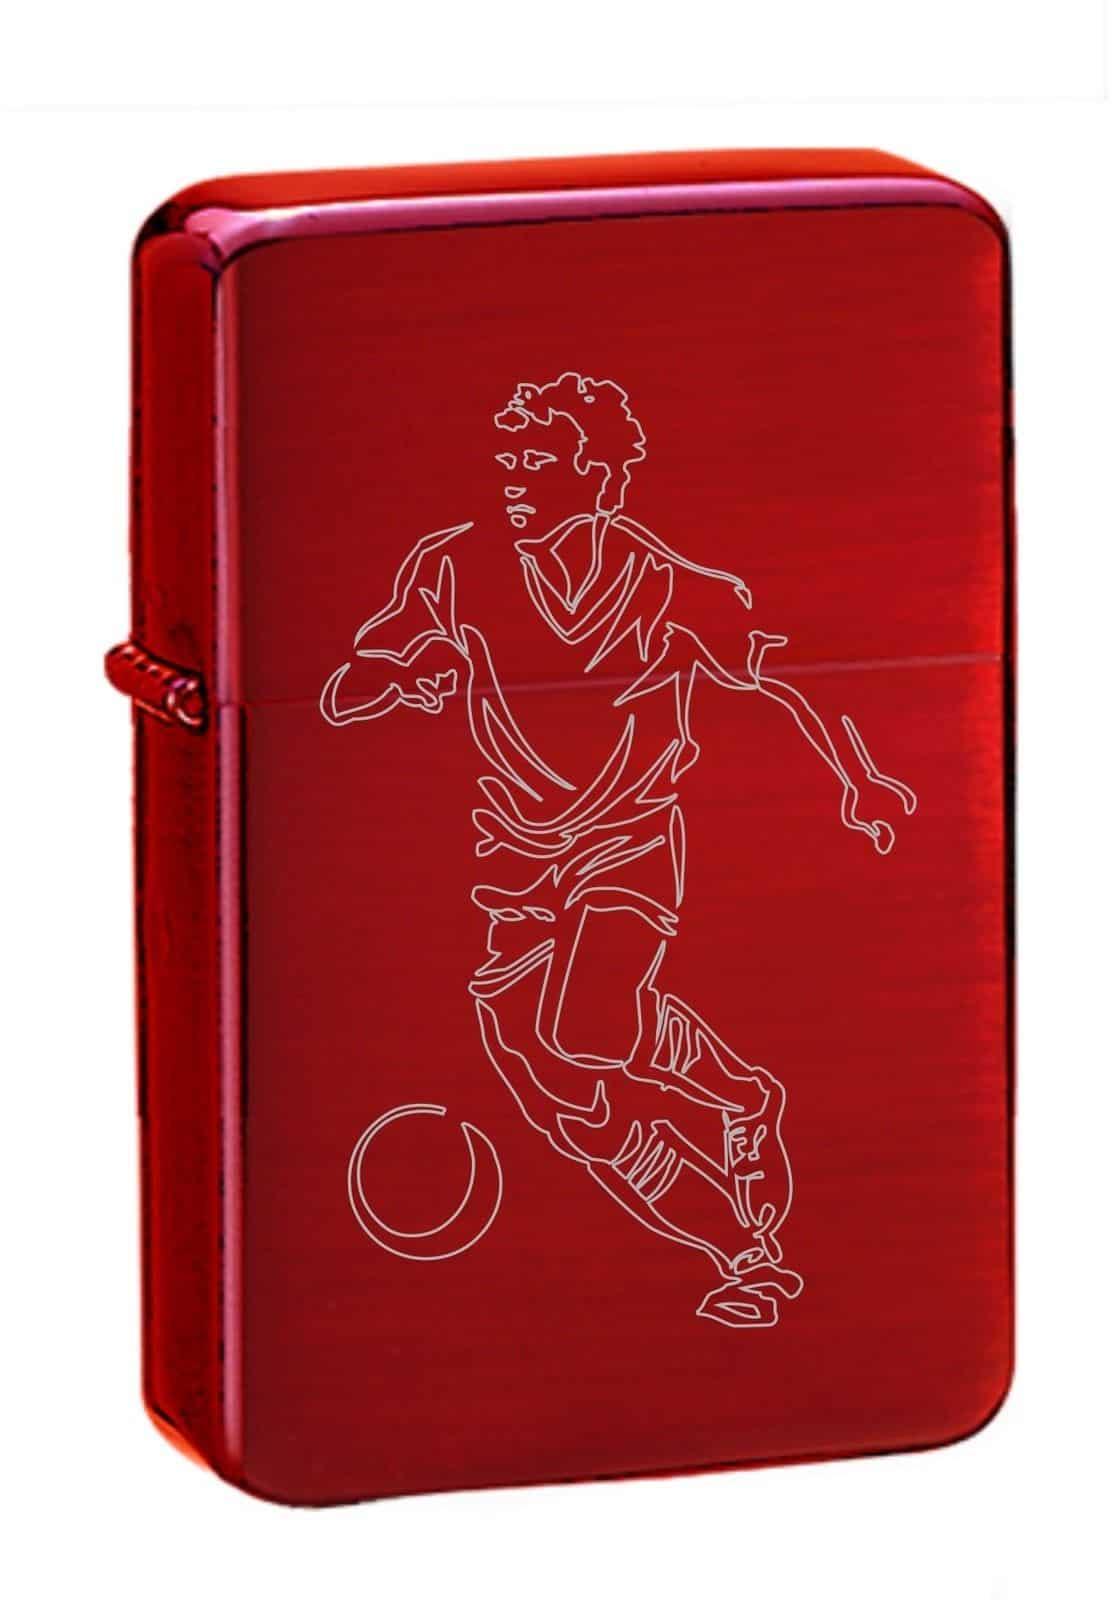 footballer-red-ice